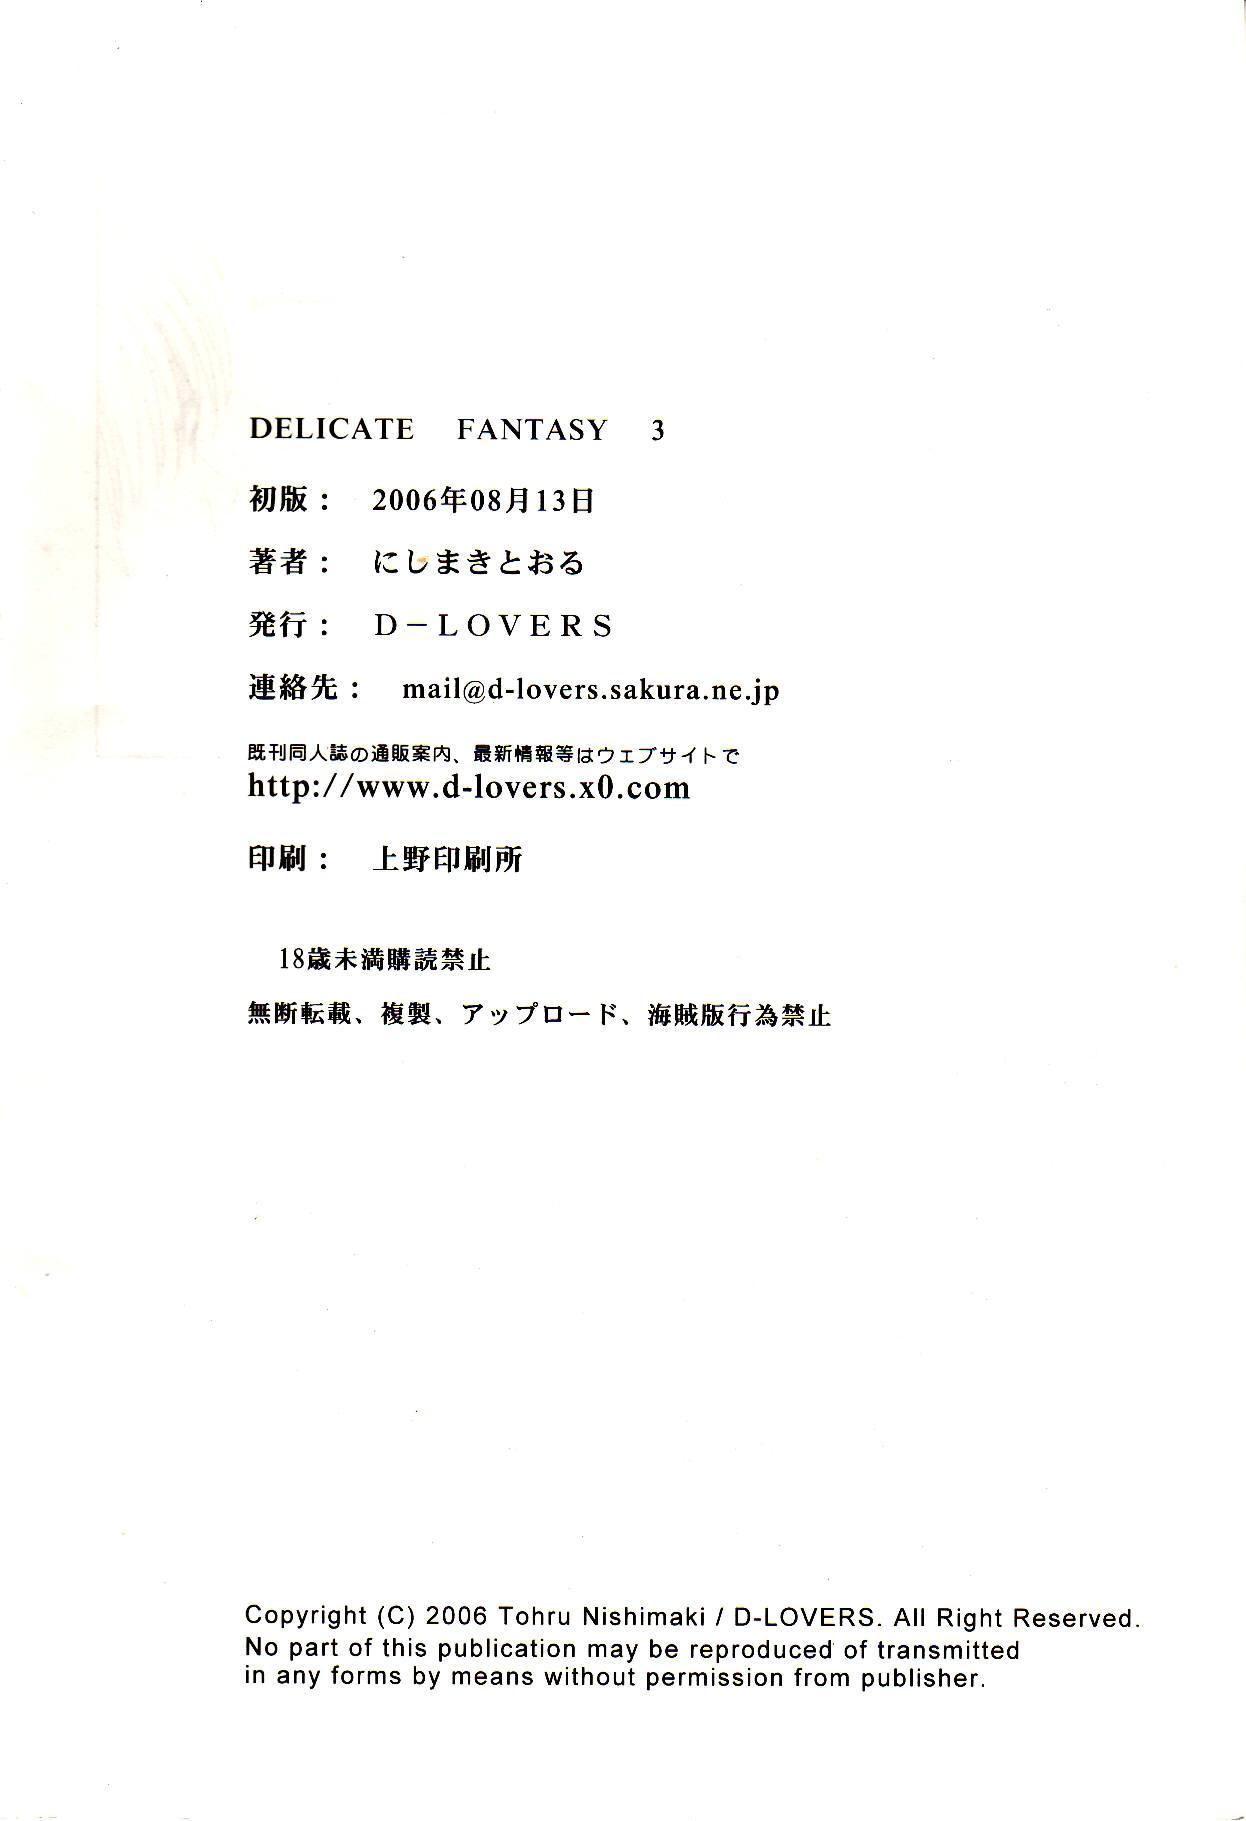 DELICATE FANTASY 3 77